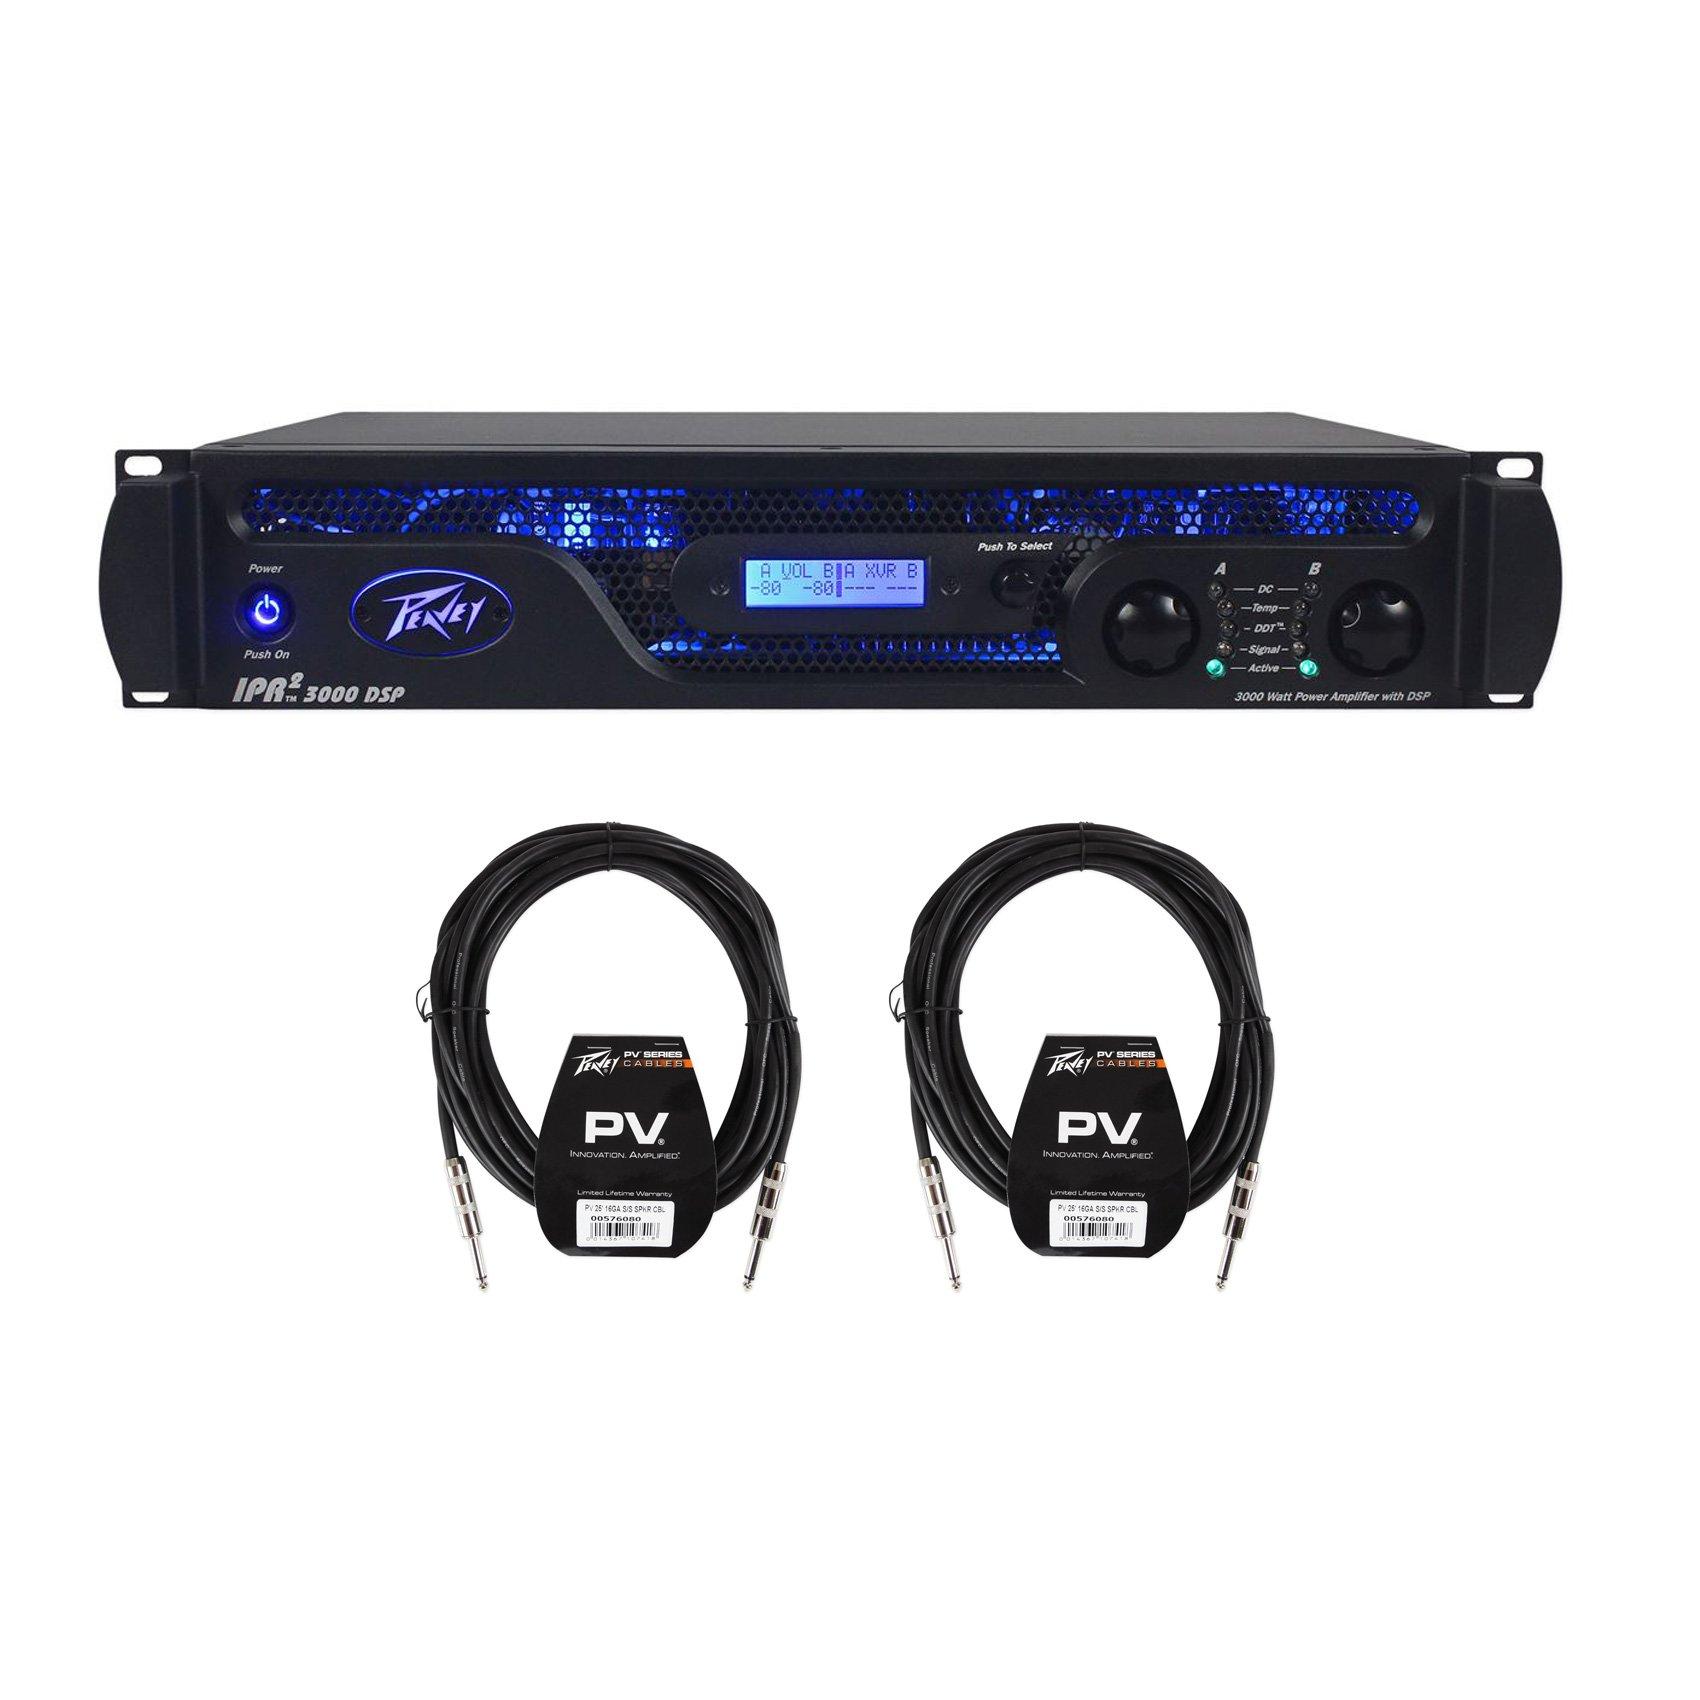 Package: Peavey IPR2 3000 DSP 3000 Watt Lightweight Class D Power Amplifier + (2) Peavey PV 25' 16 Gauge Speakon to Speakon Speaker Cables by Peavey